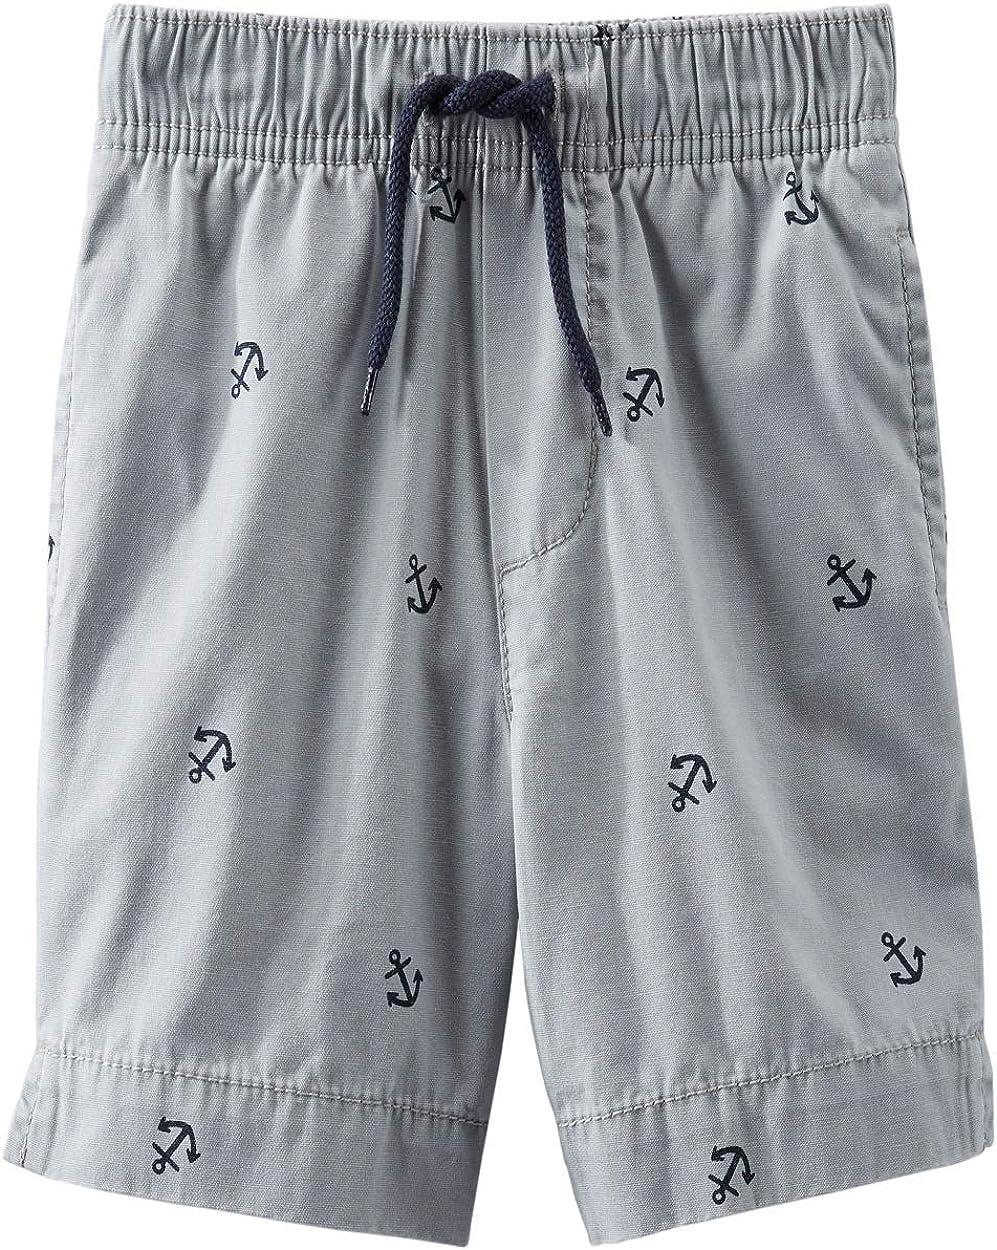 OshKosh BGosh Baby Boys Grey Anchor Shorts